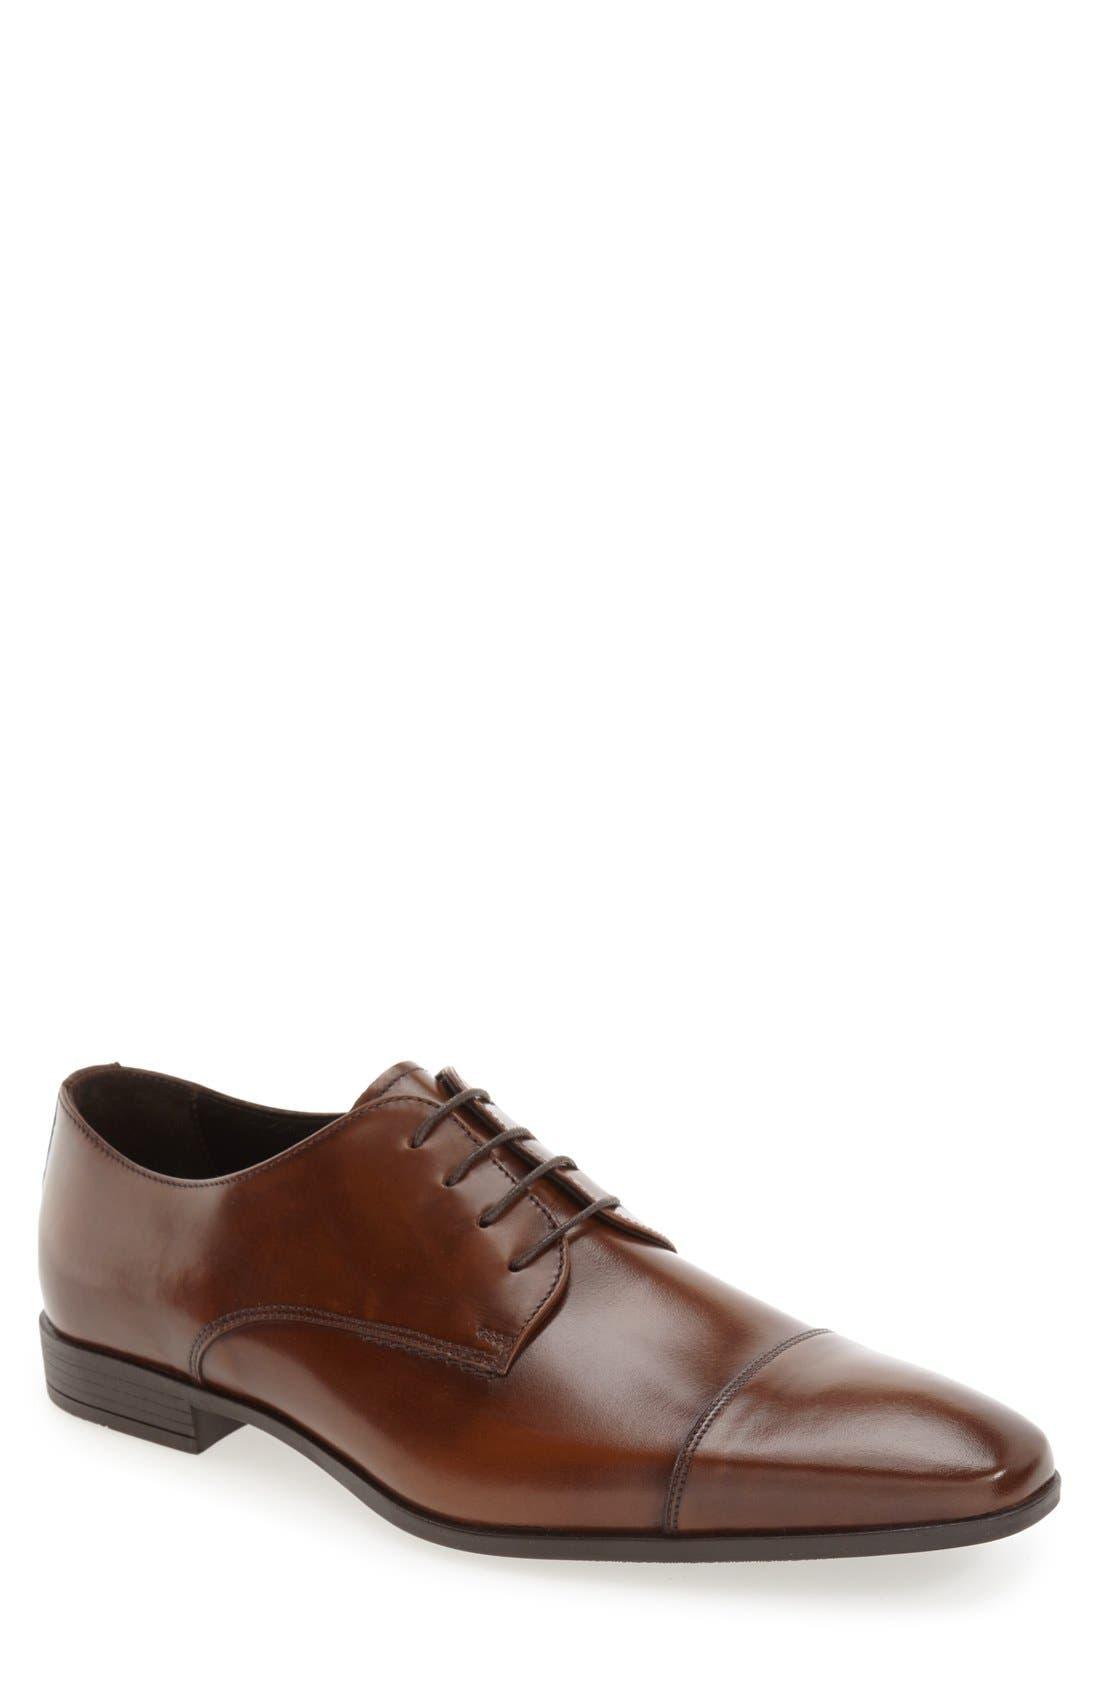 'Stark' Cap Toe Derby,                         Main,                         color, Tan Leather